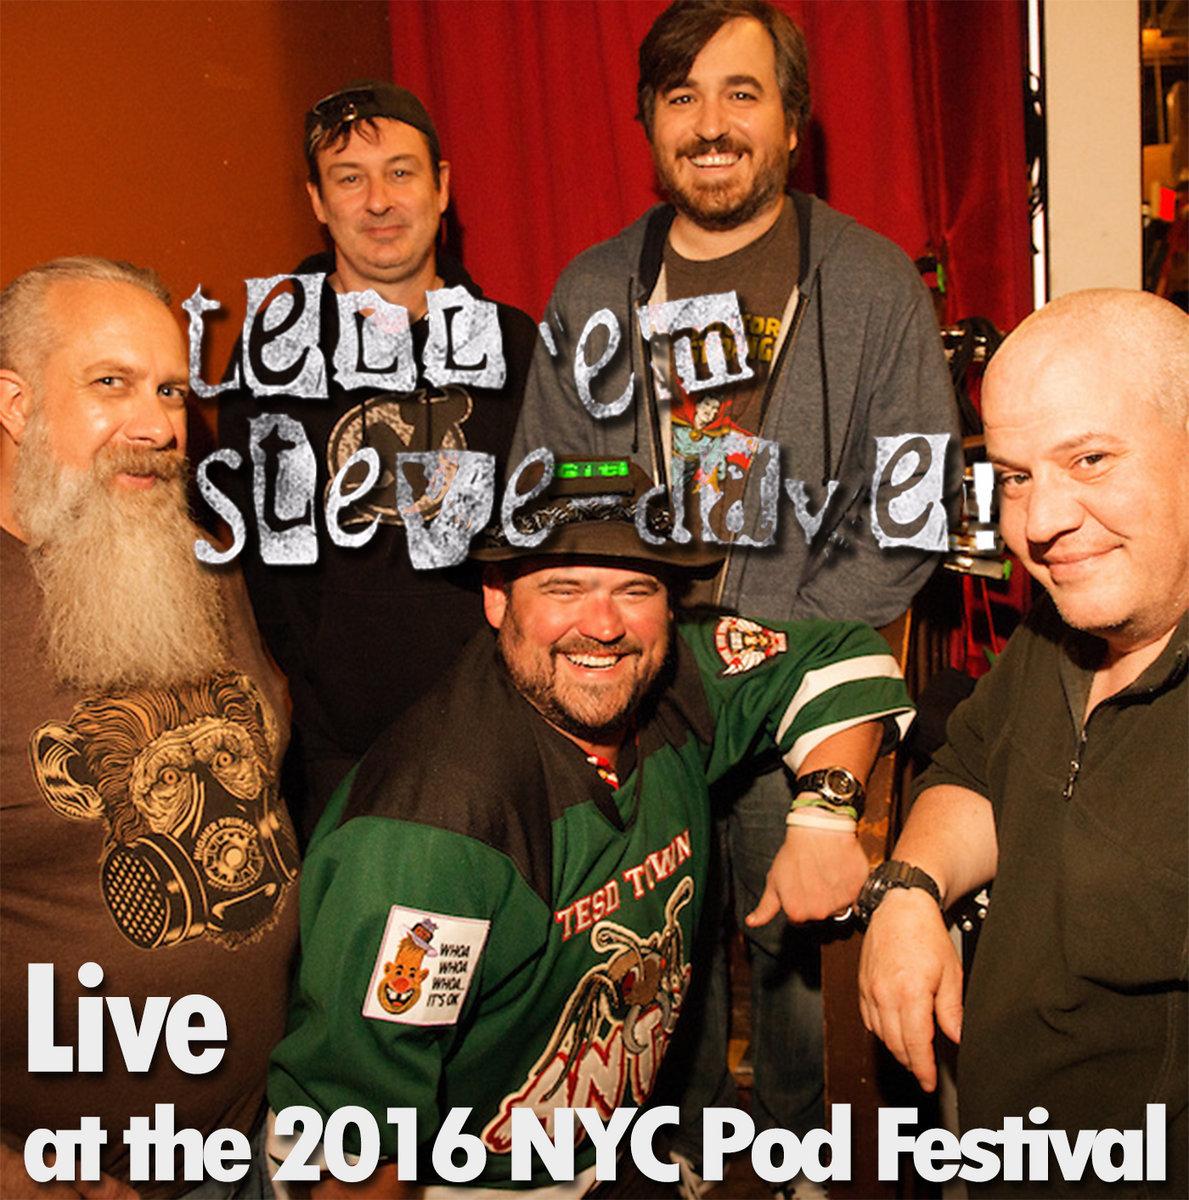 Nyc Podfest 2016 The Long Burn